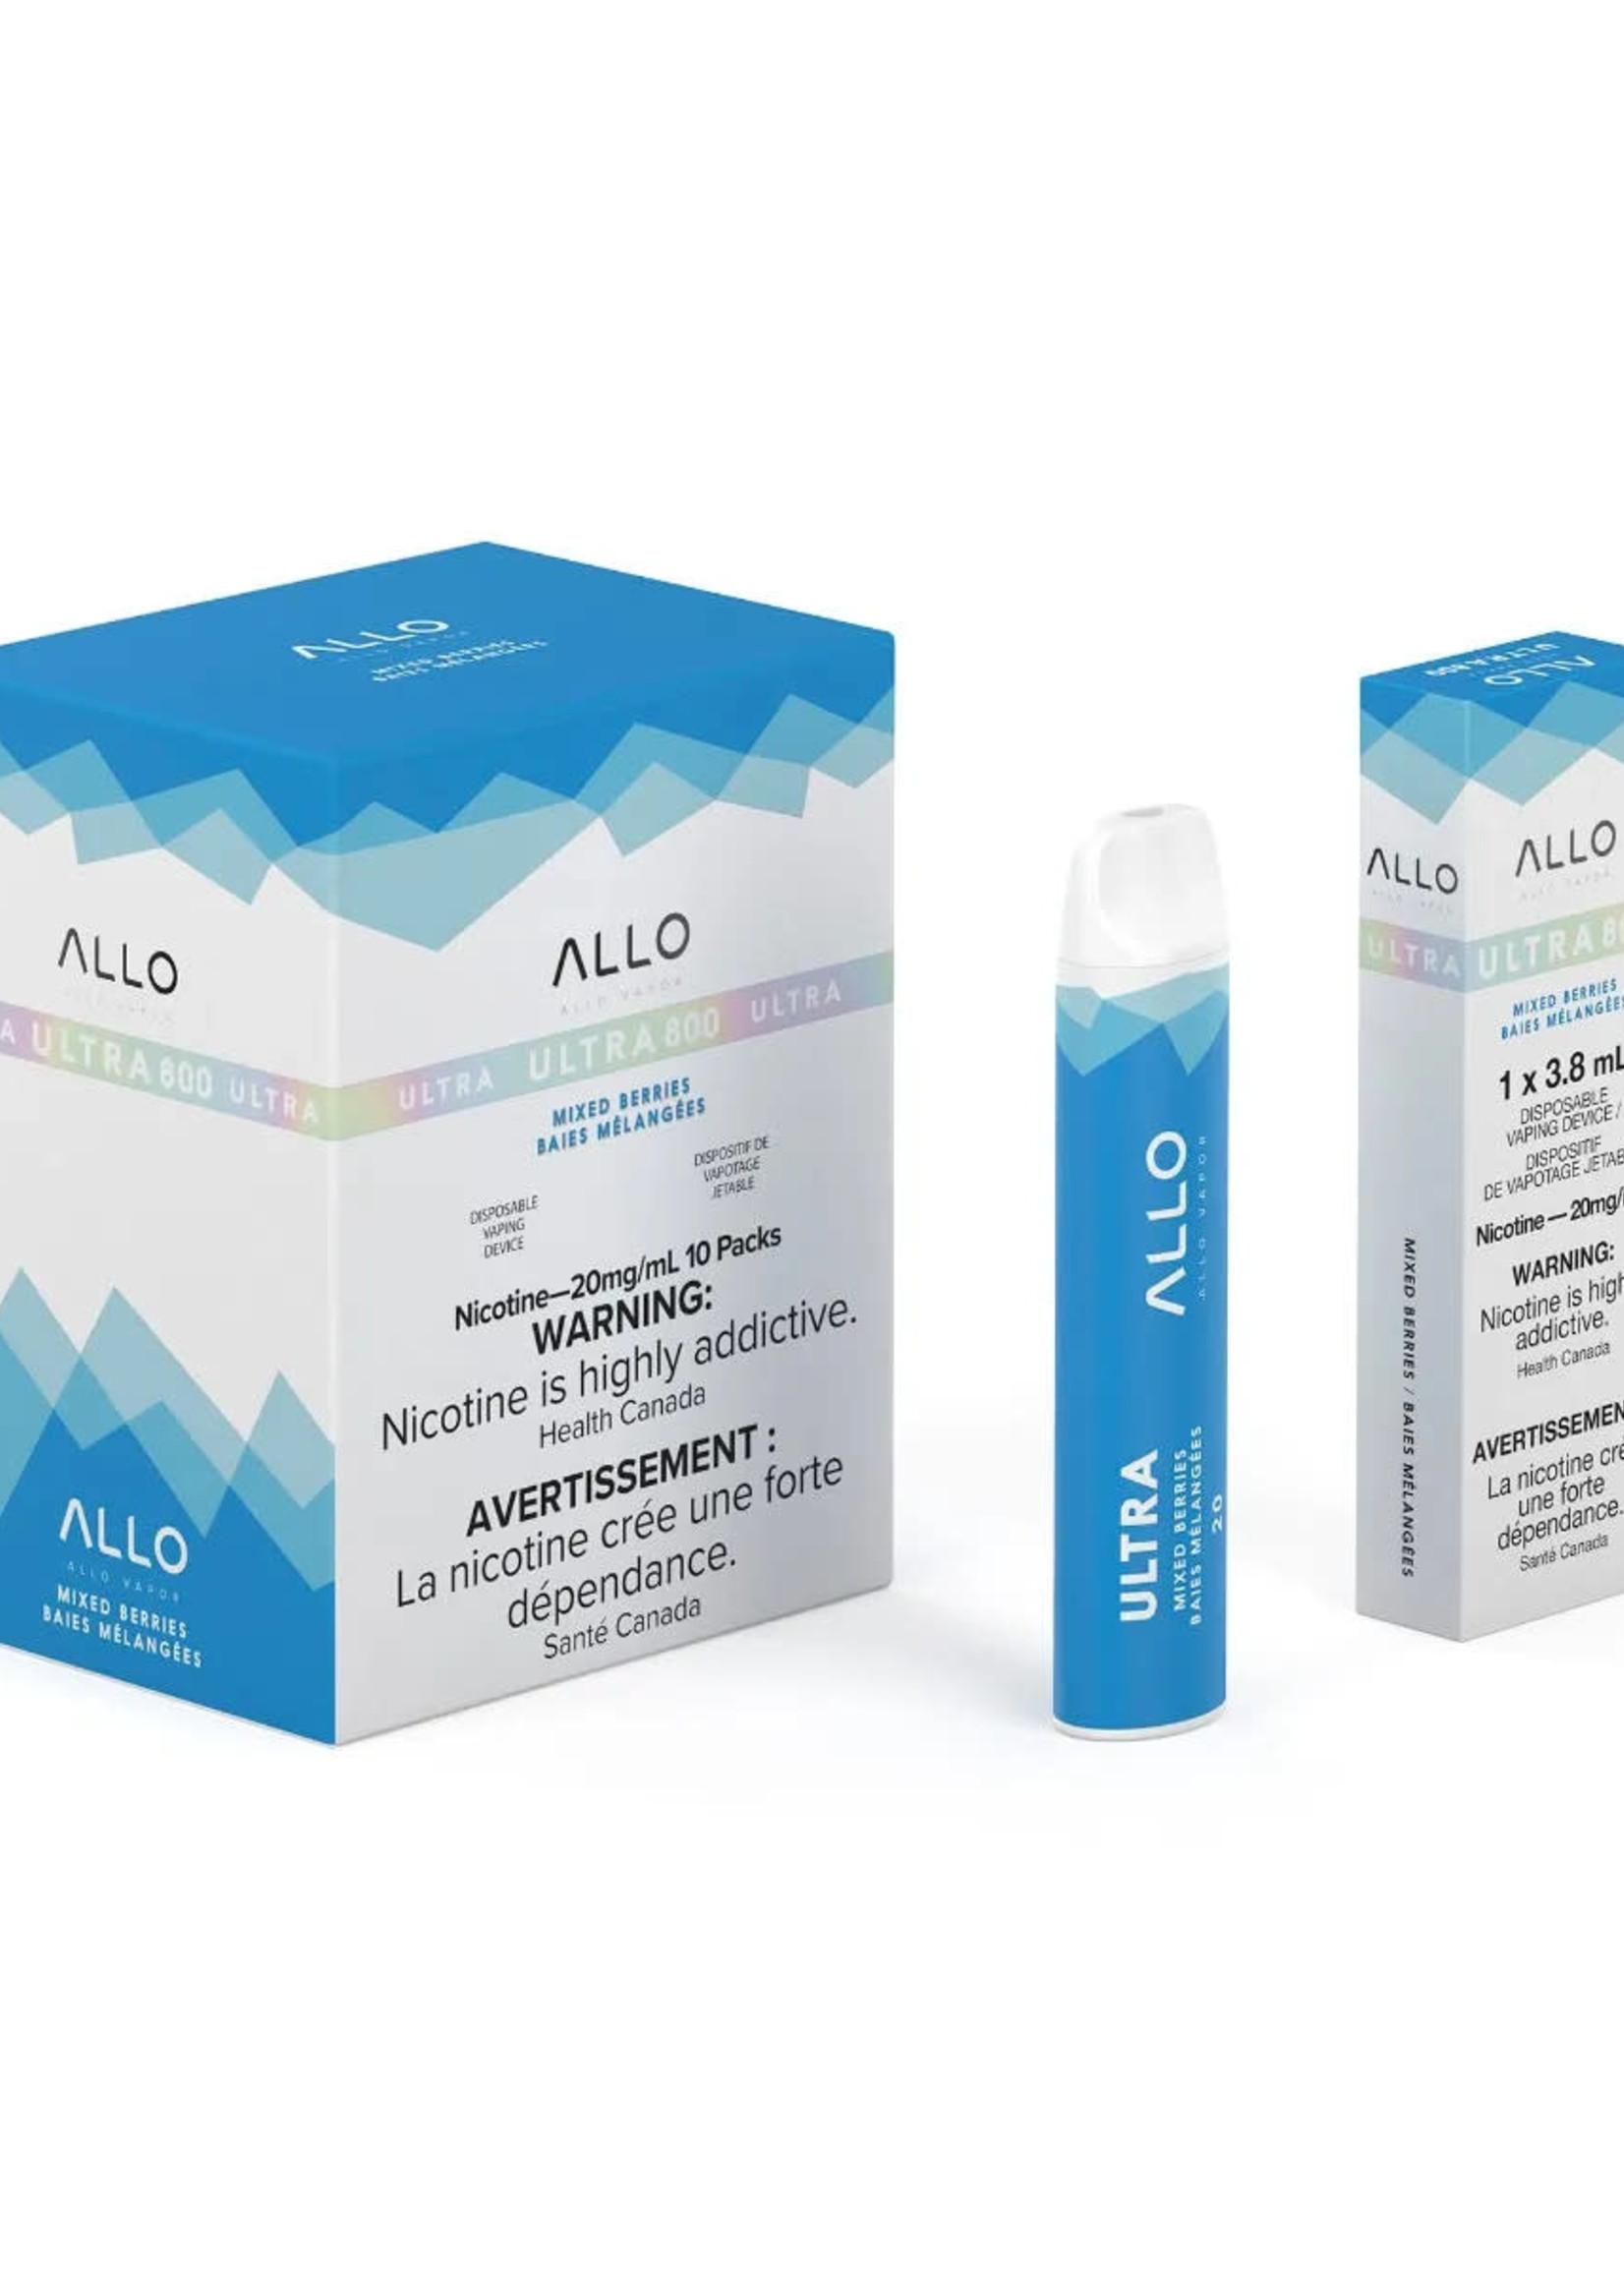 allo Allo - Mixed Berries